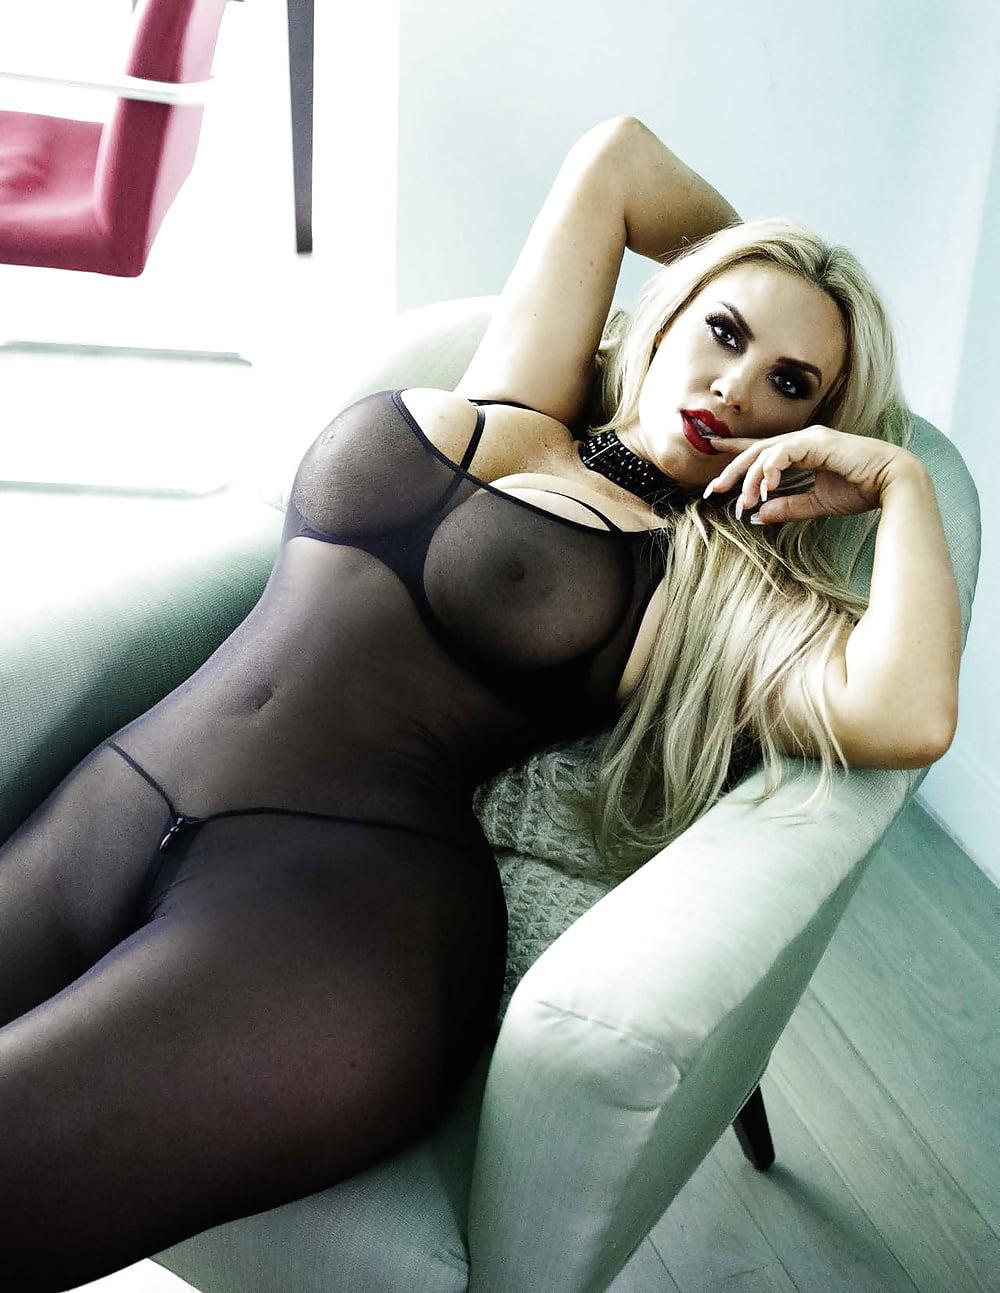 Coco austin nude sex anal